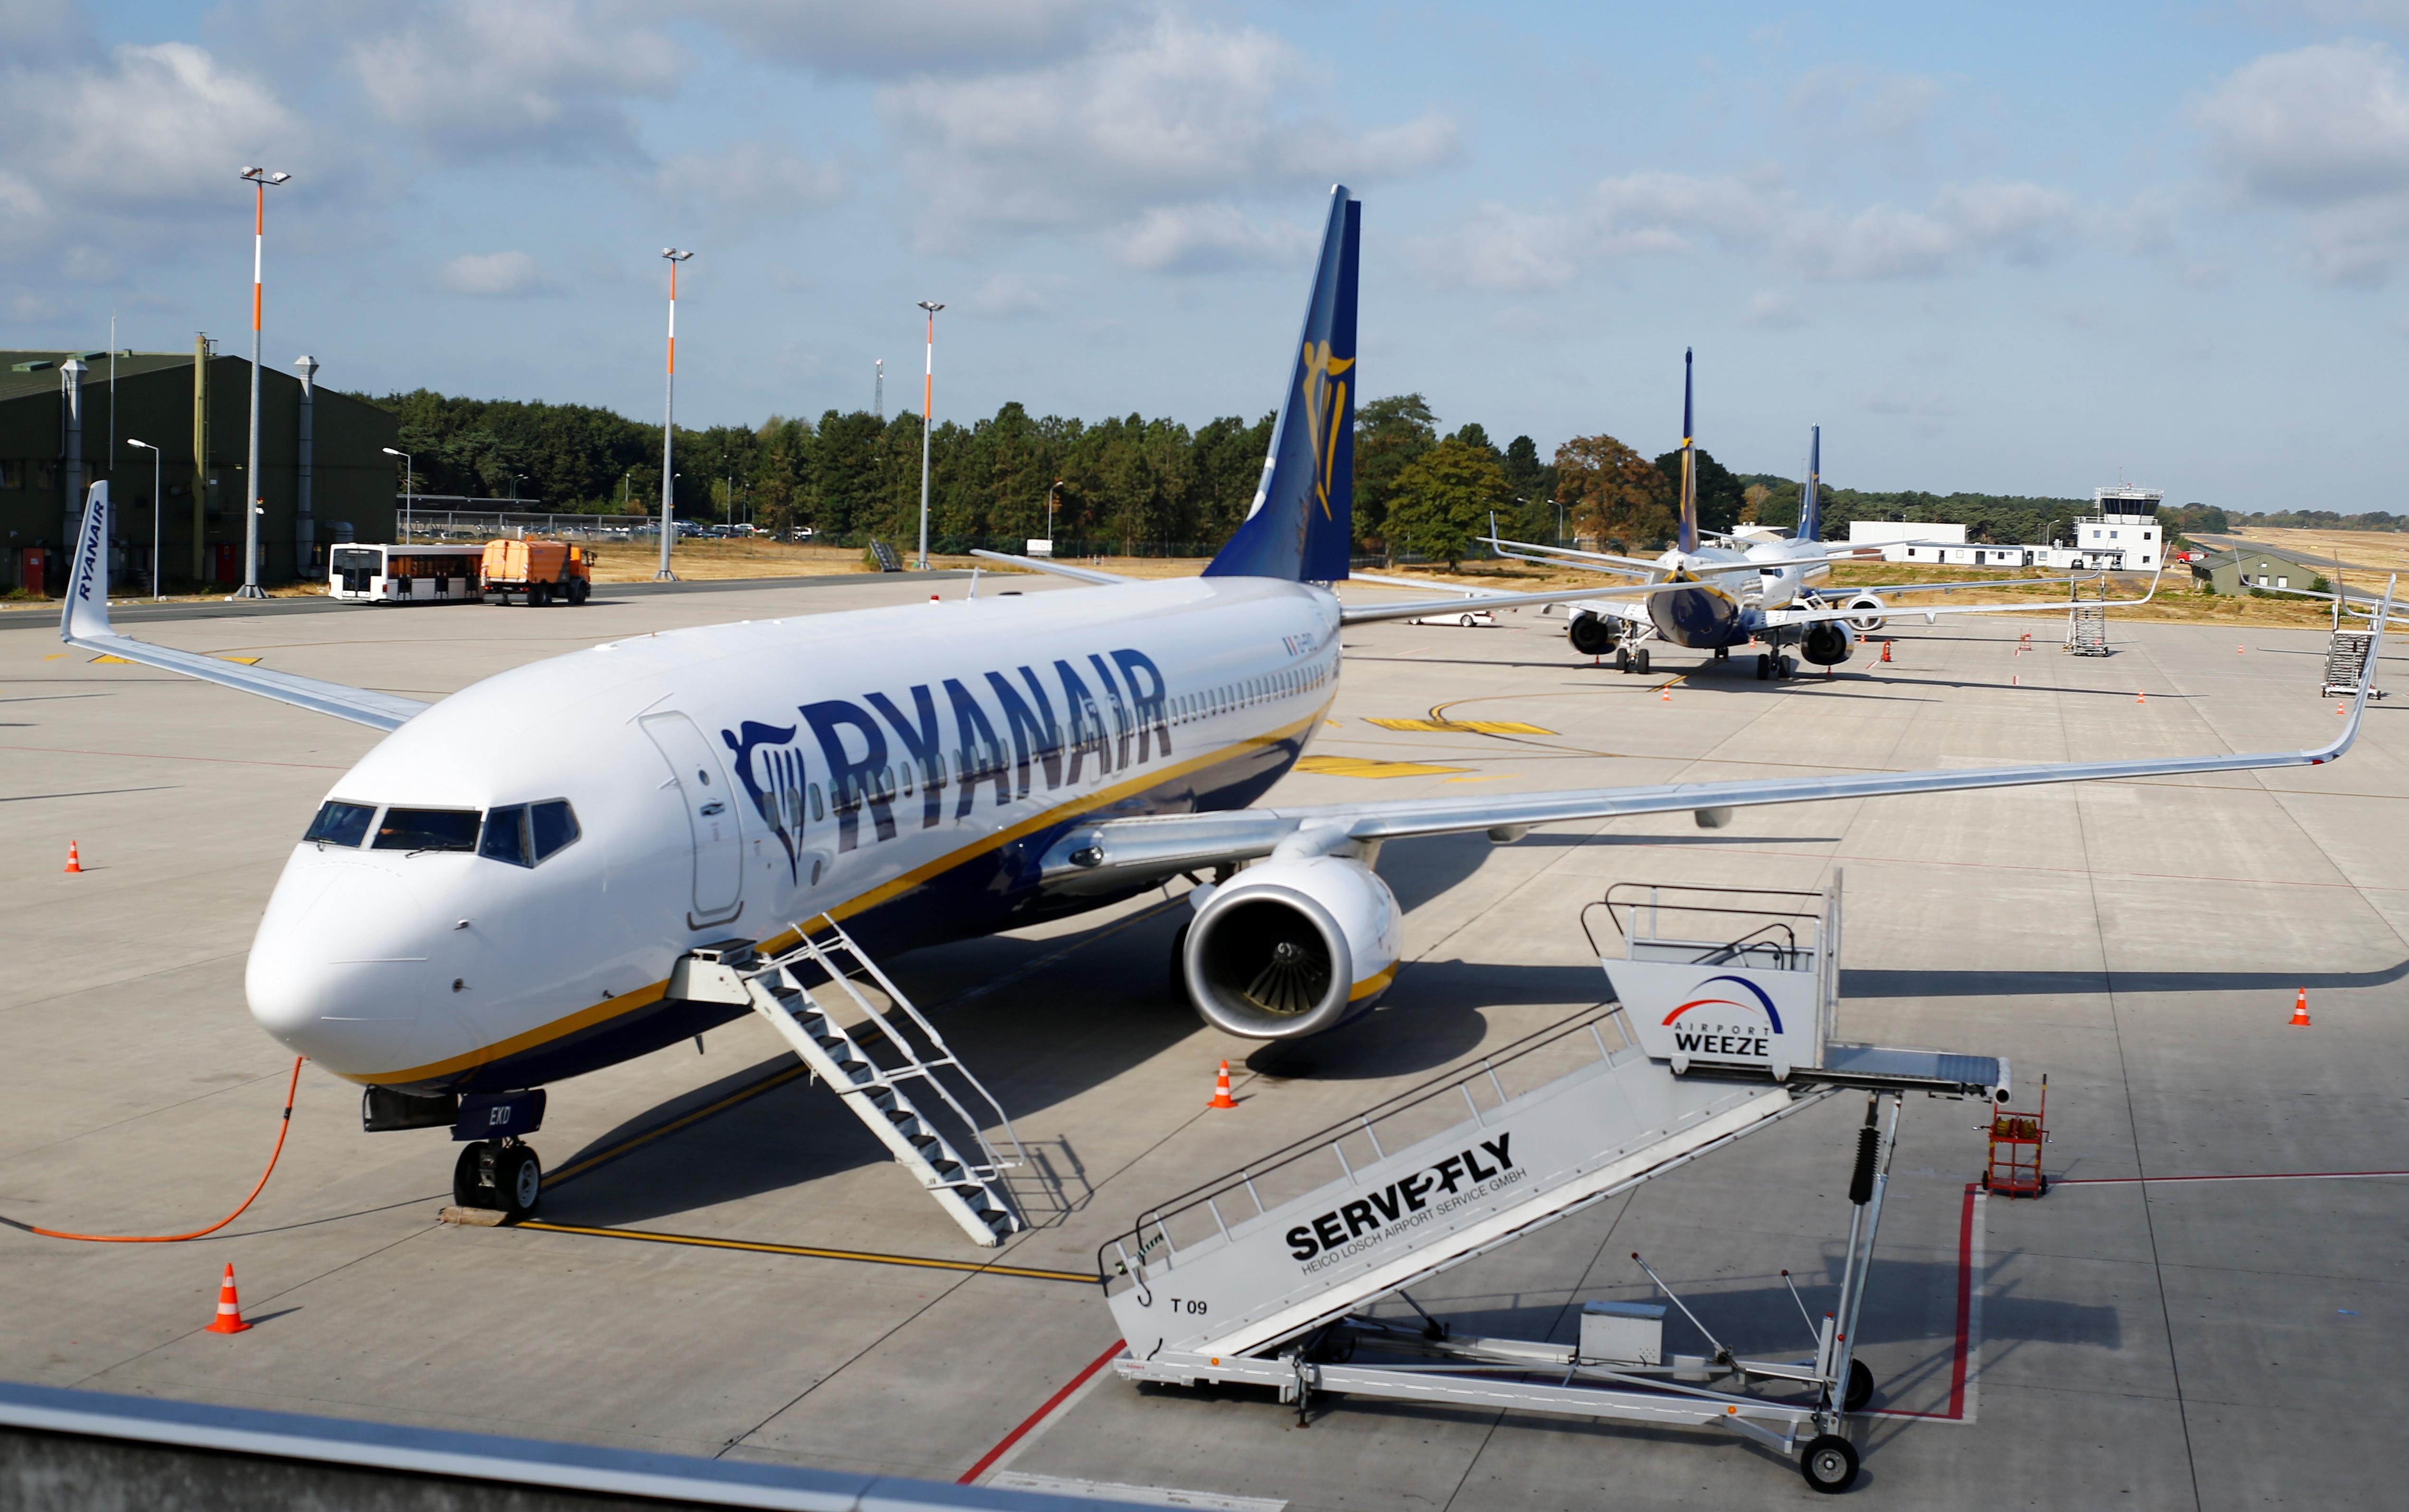 German union Verdi calls on Ryanair cabin crew to strike on Friday